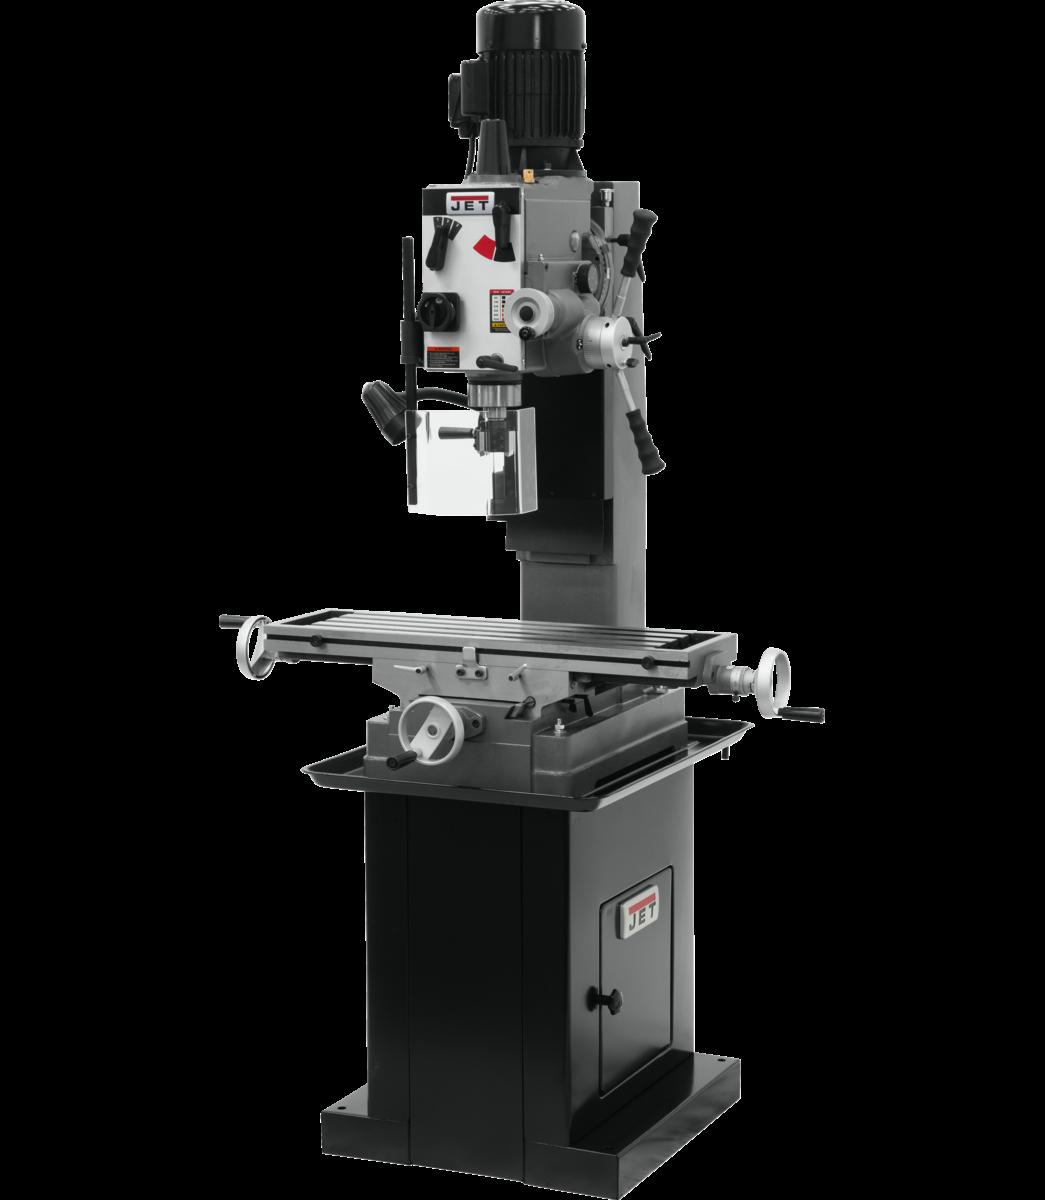 JMD-45GHPF Geared Head Square Column Mill/Drill with Power Downfeed